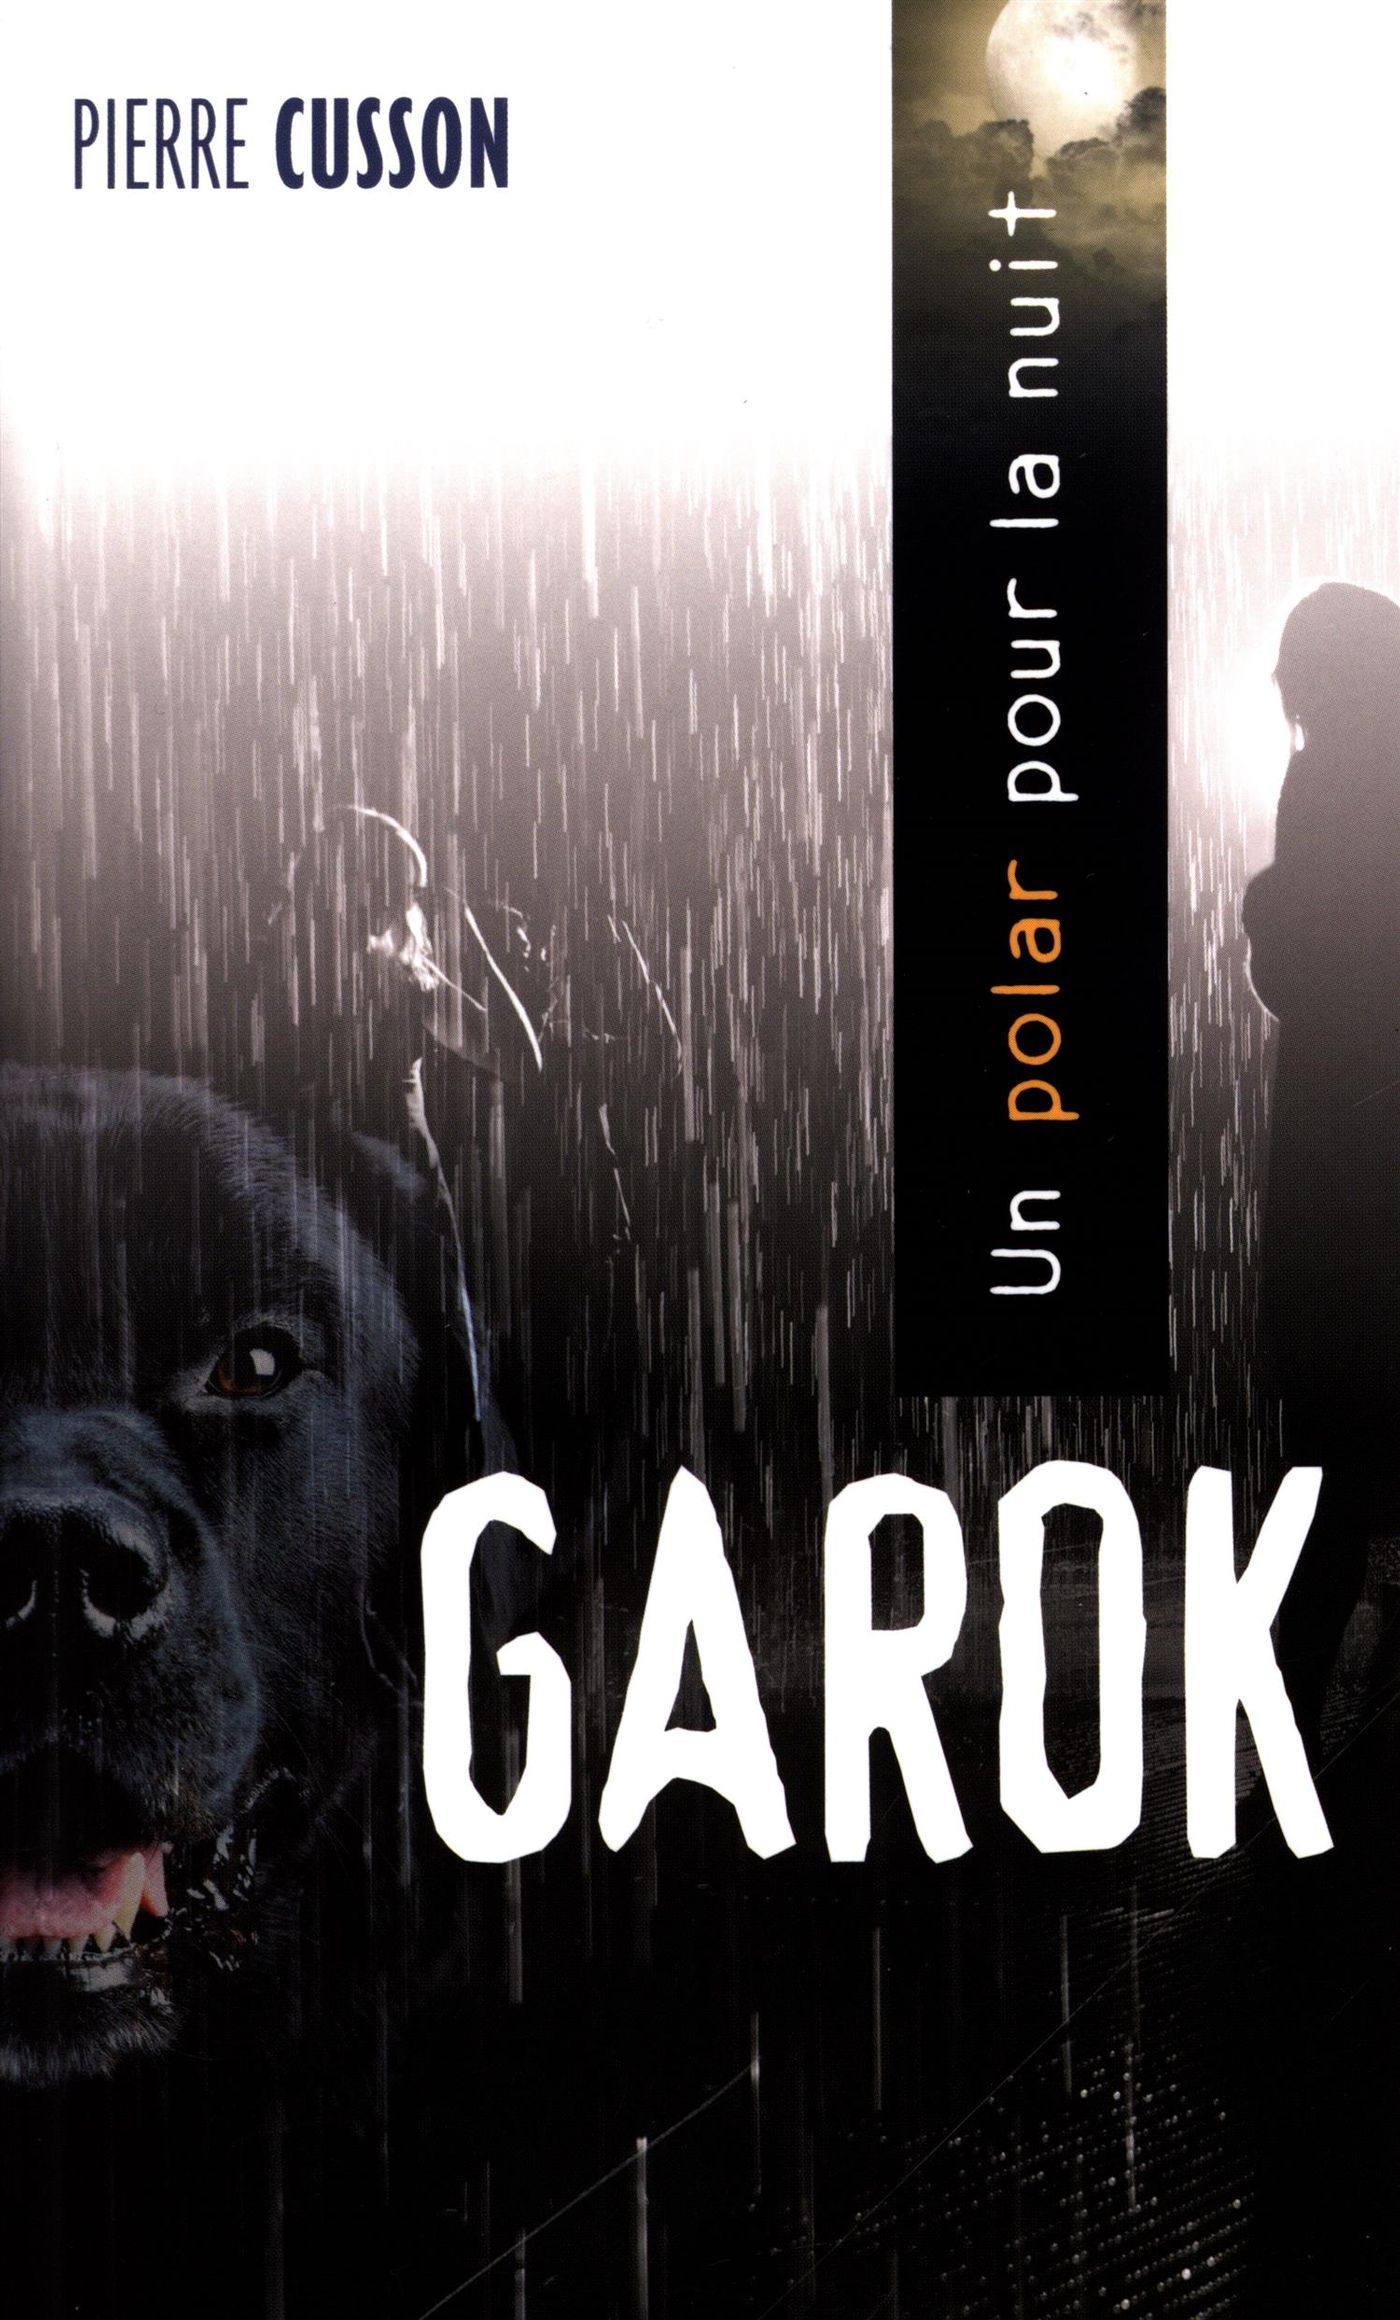 Garok